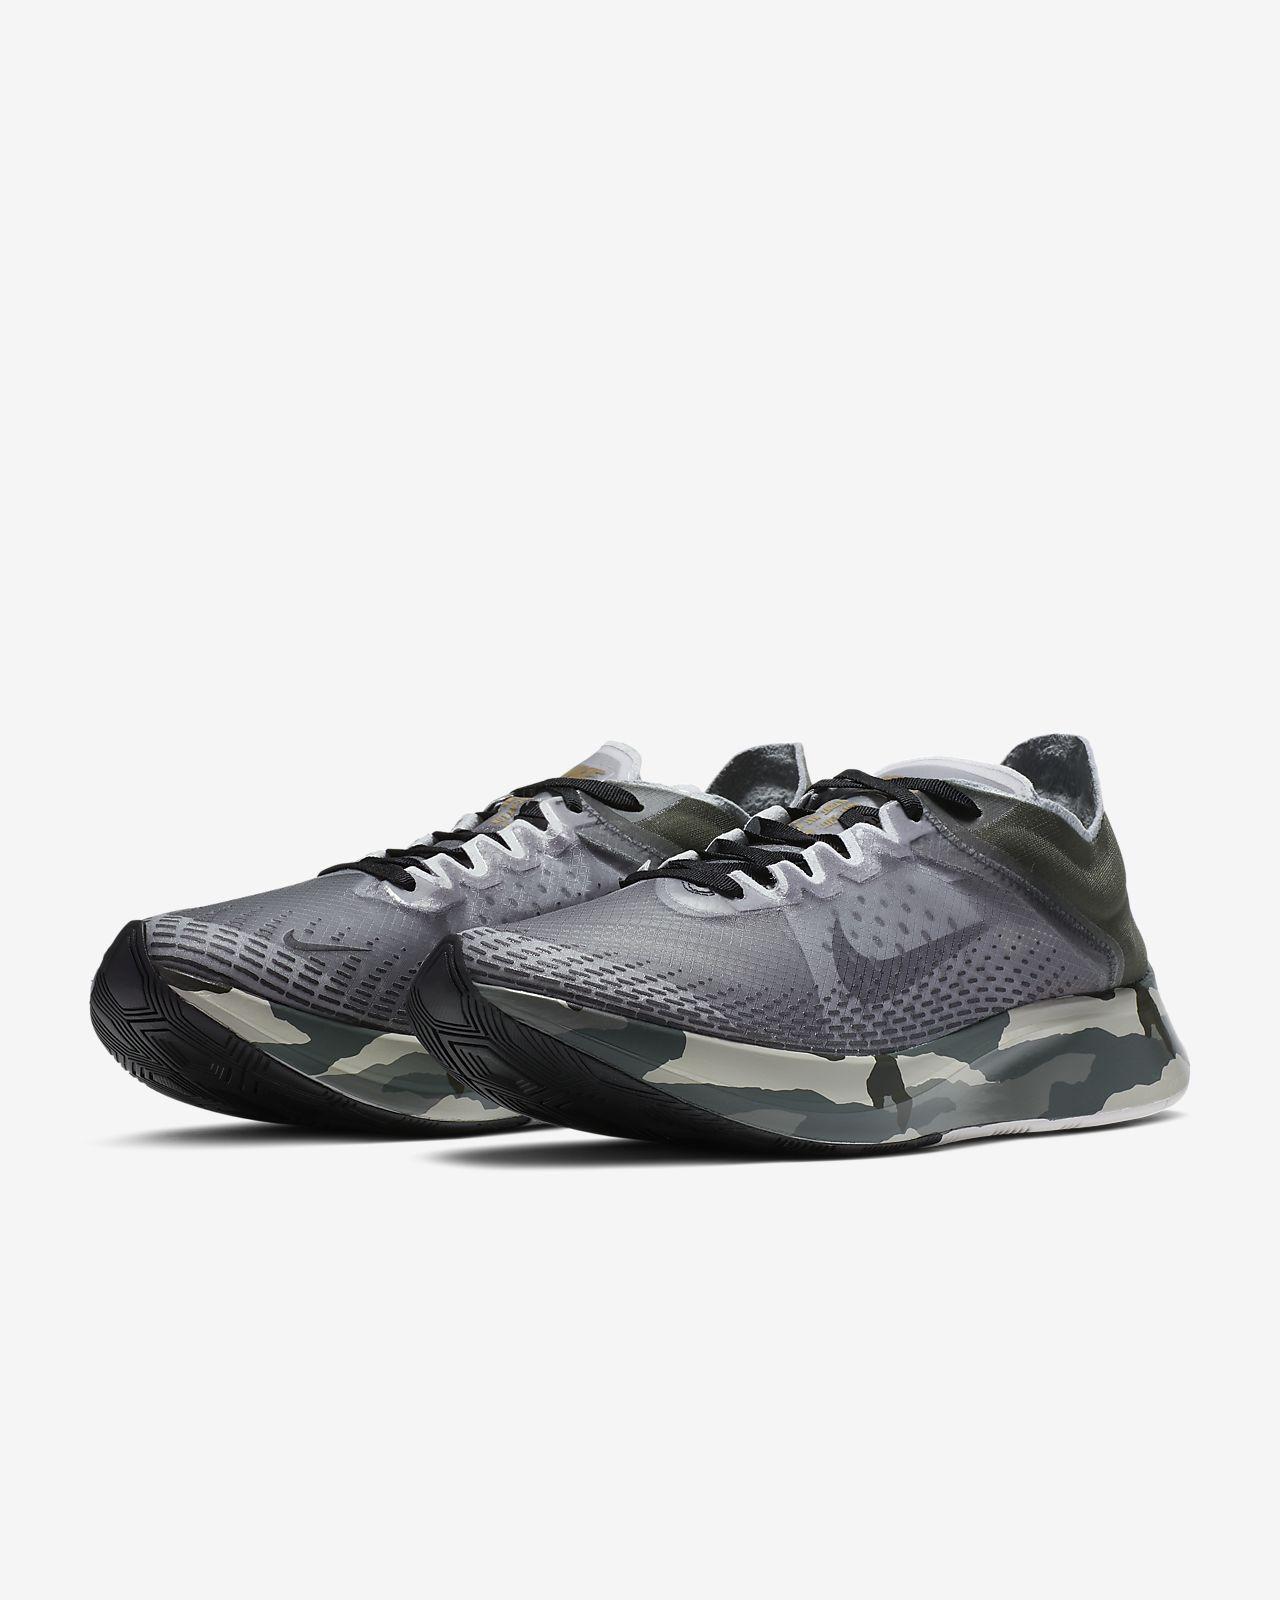 ff2ad30c908 Nike Zoom Fly SP Fast Running Shoe. Nike.com LU